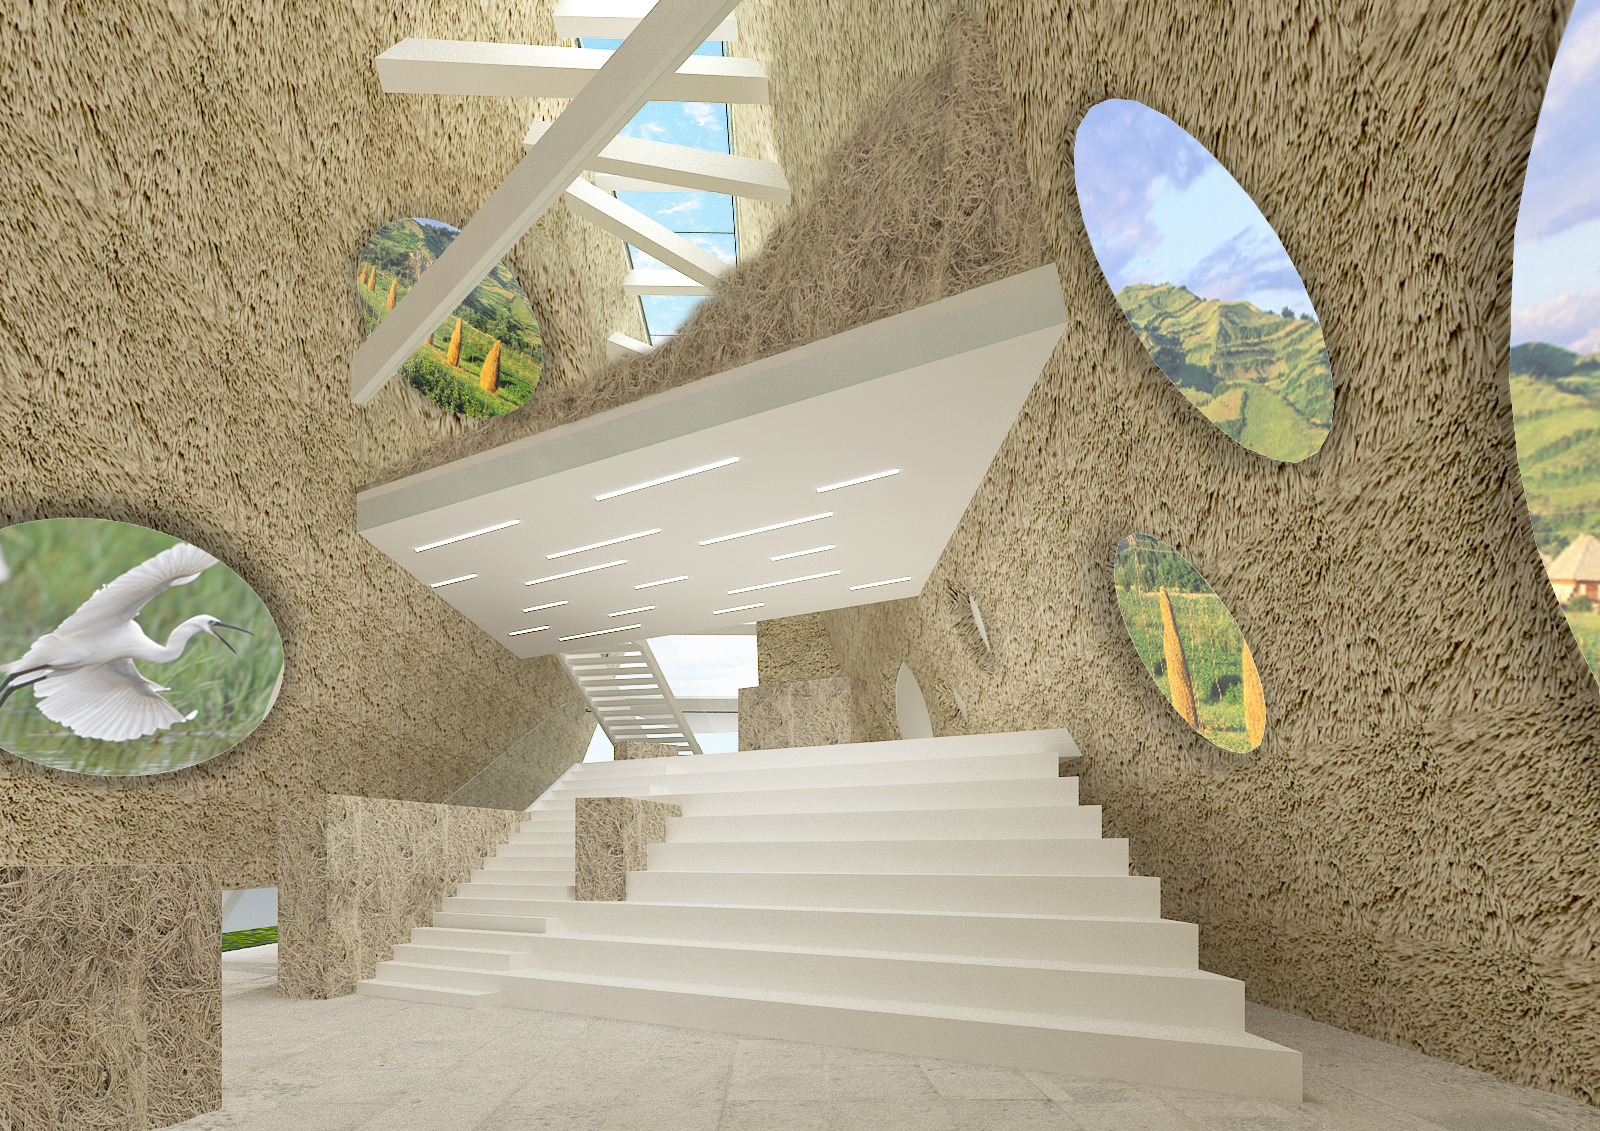 https://nbc-arhitect.ro/wp-content/uploads/2020/10/NBC-Arhitect-_-contests-_-Romanian-Pavillion-_-Milan-Expo-Contest-2015_8.jpg